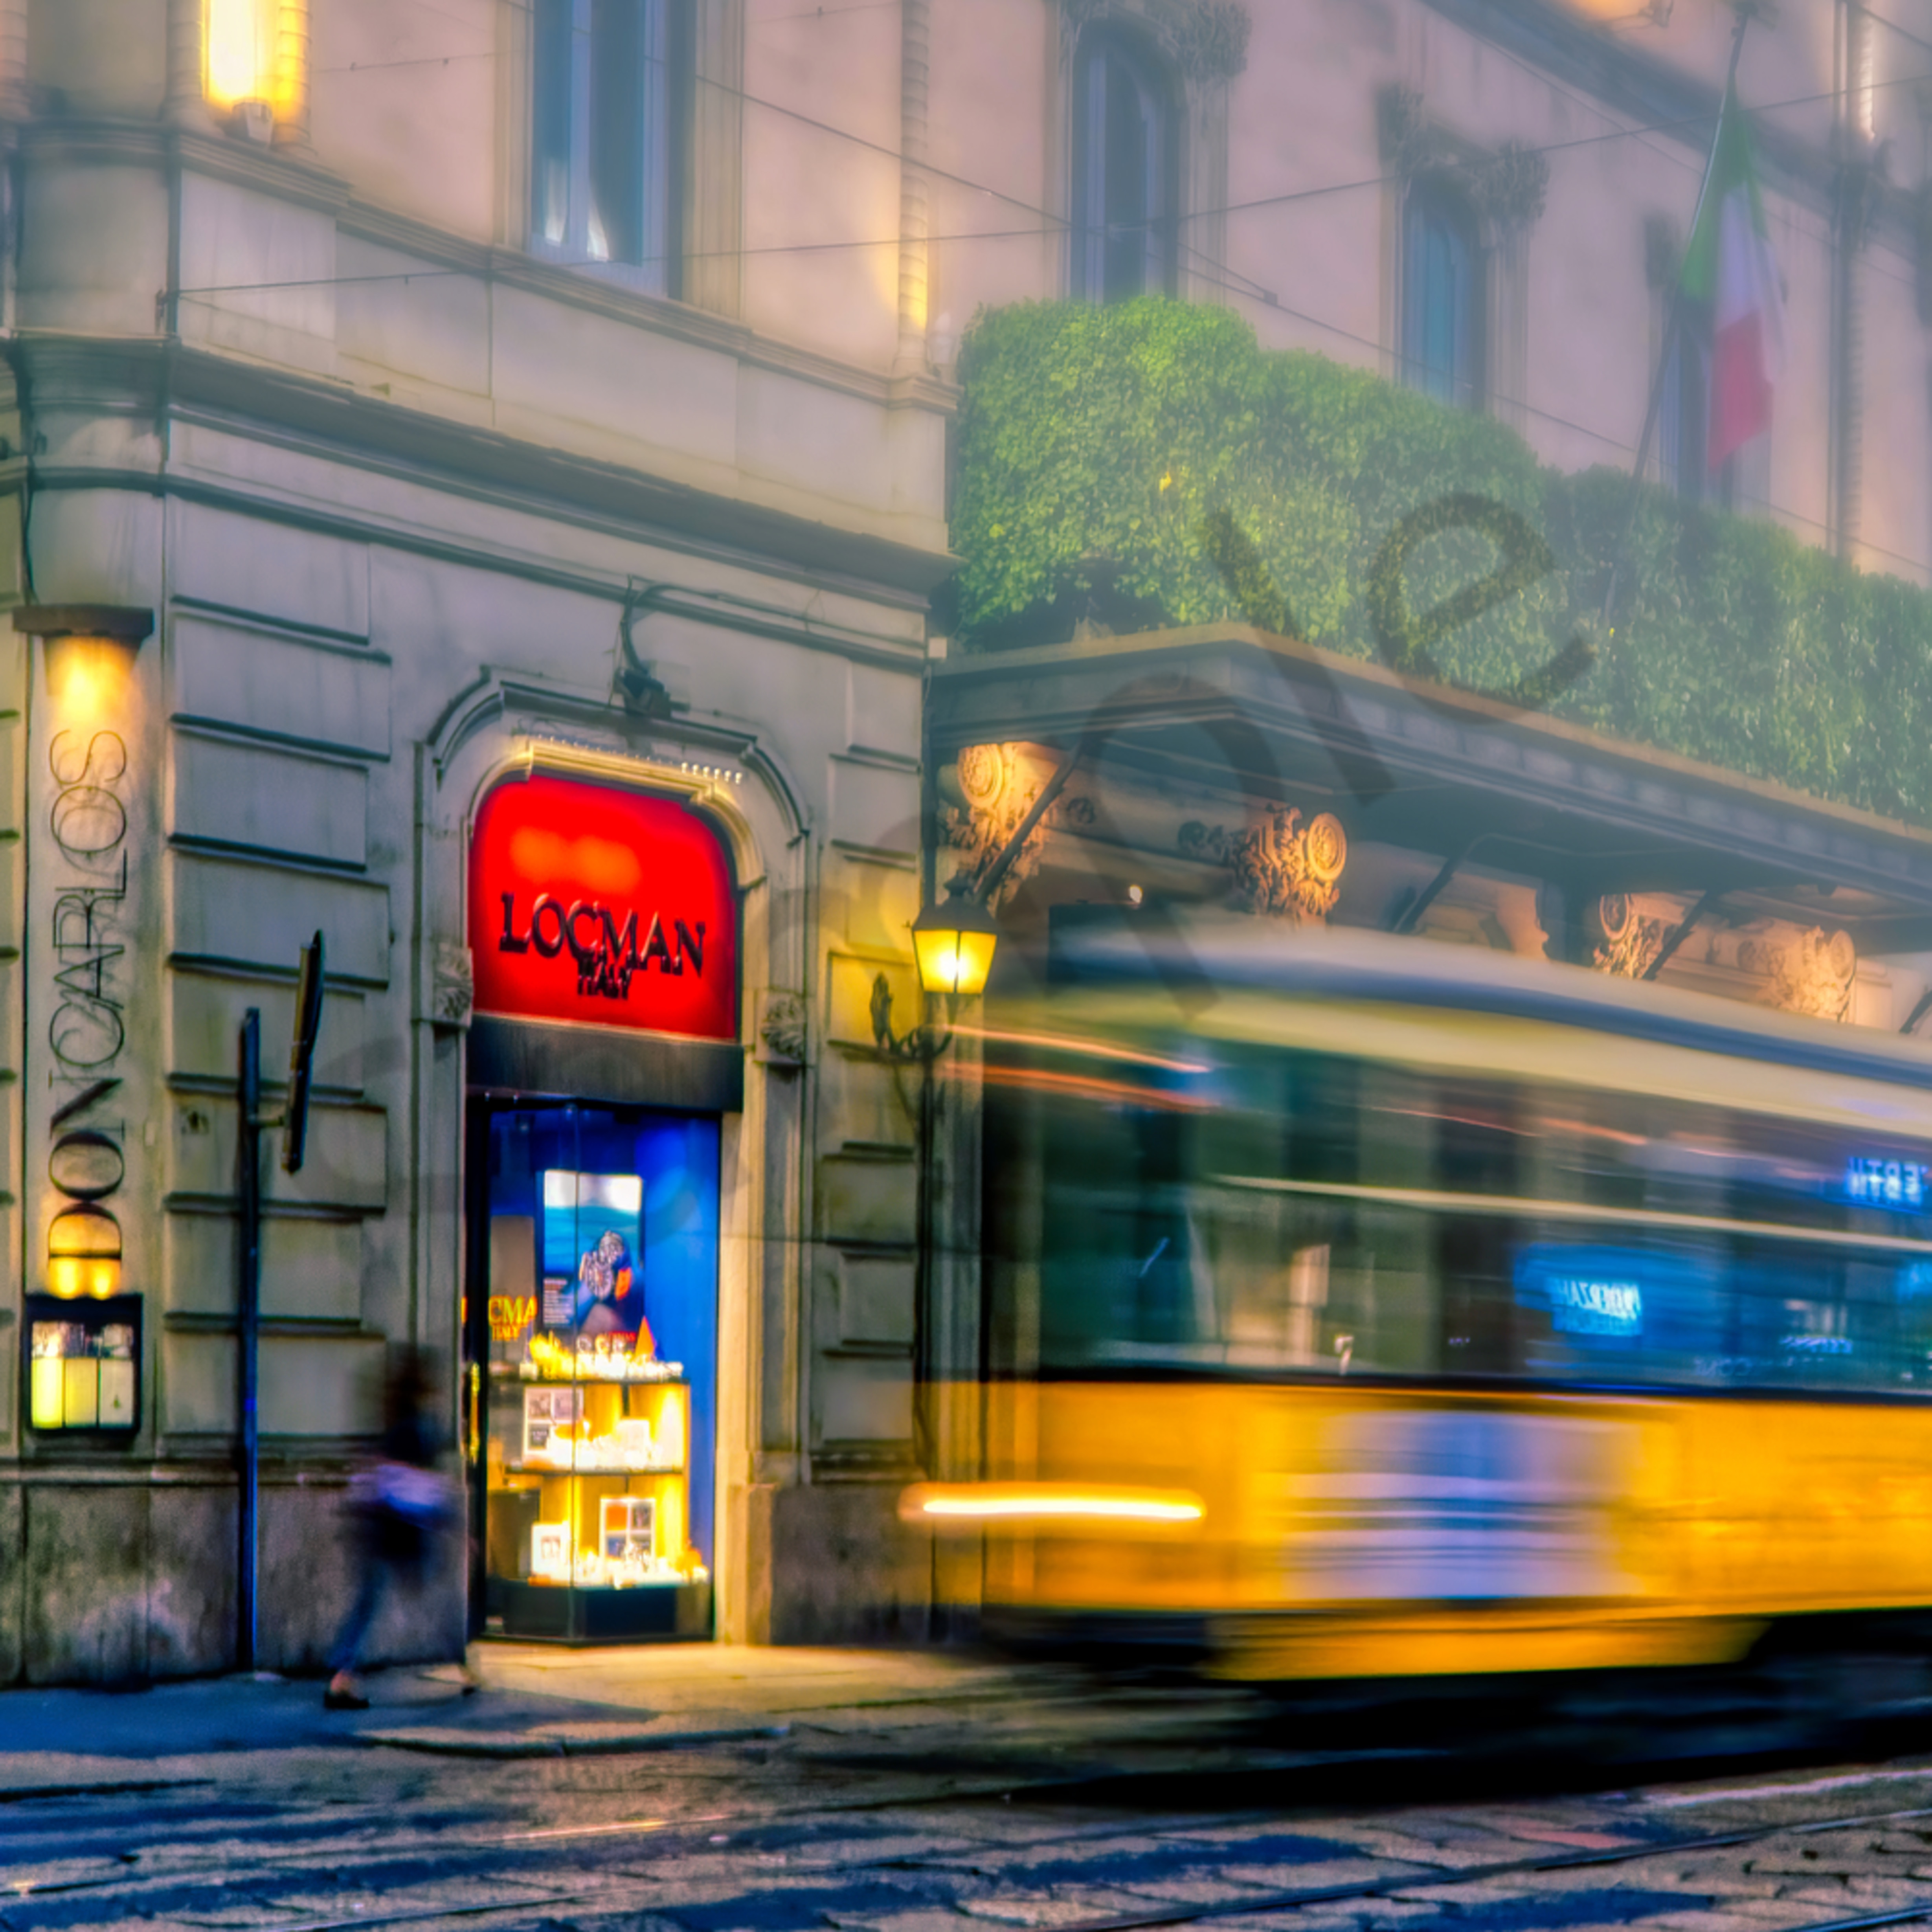 Milan streetcar print vn2kep